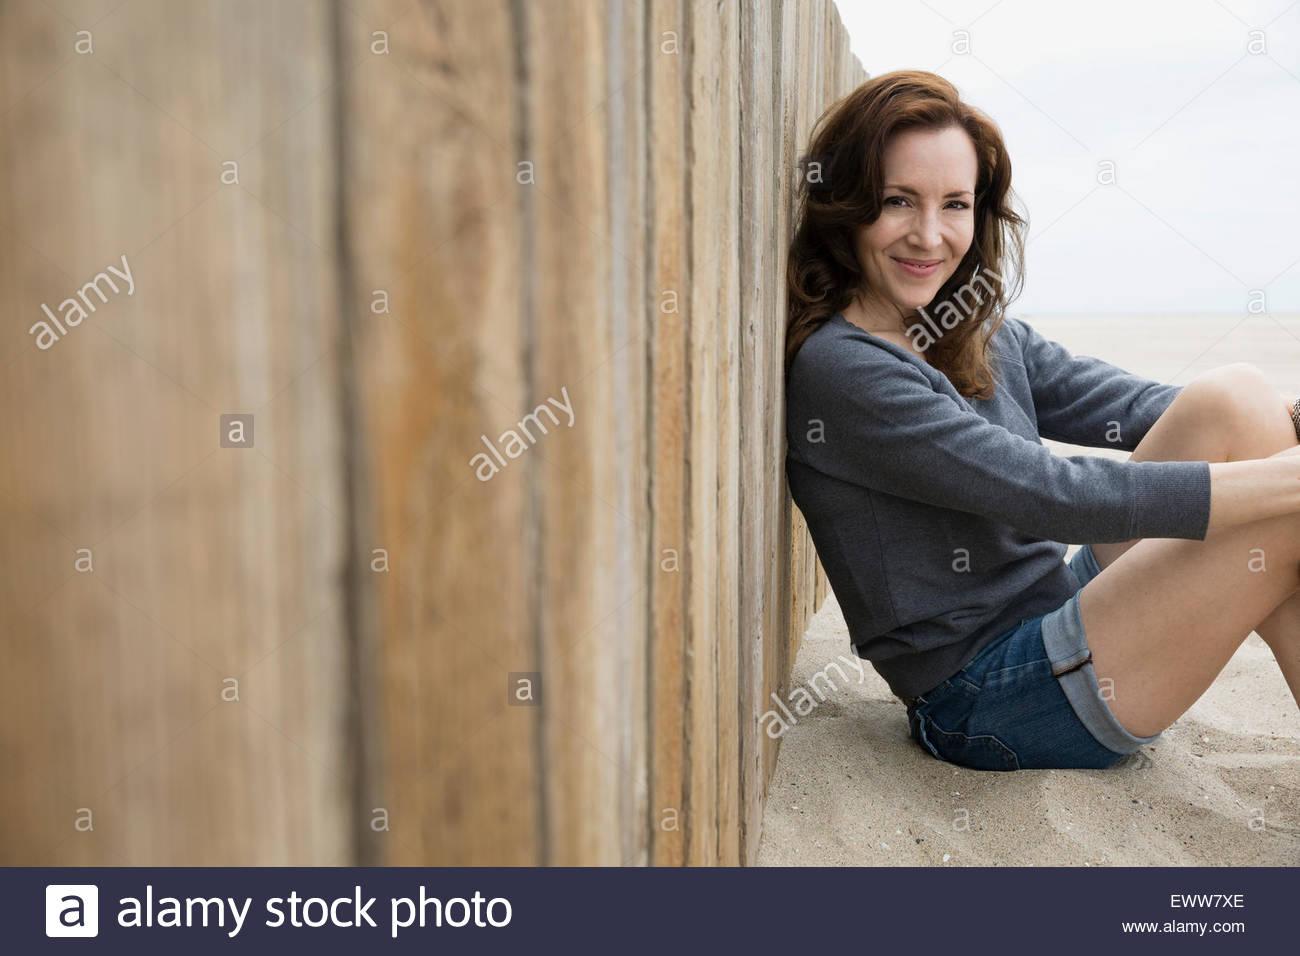 Porträt lächelnde Brünette Frau sitzt am Strand Wand Stockbild